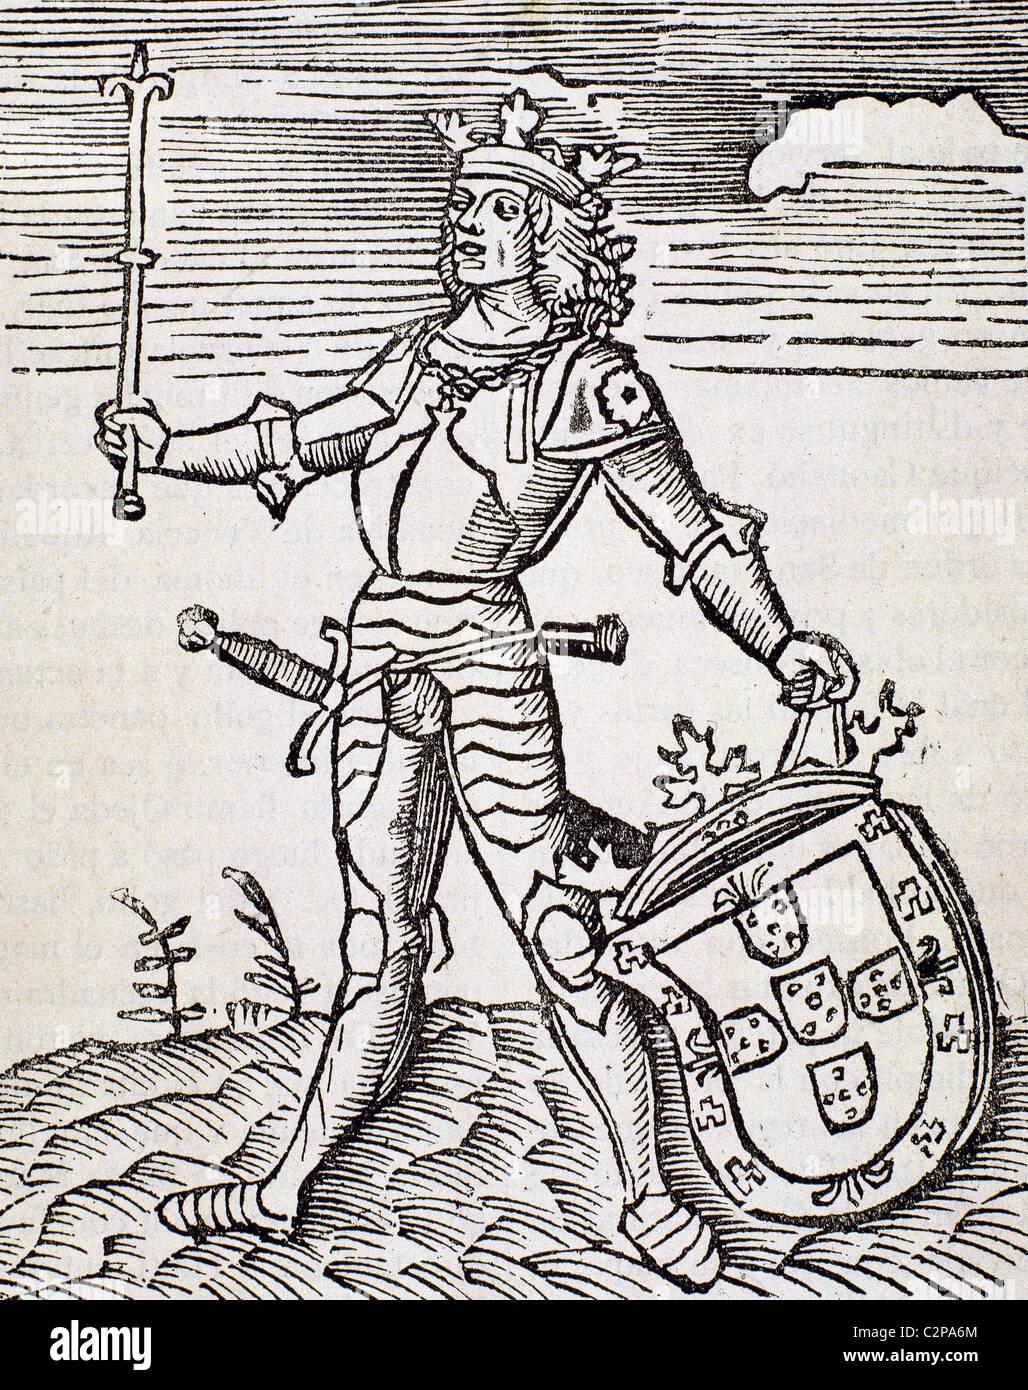 Vespucci, Amerigo (1454-1512). Italian navigator, explorer and cartographer. Engraving. - Stock Image